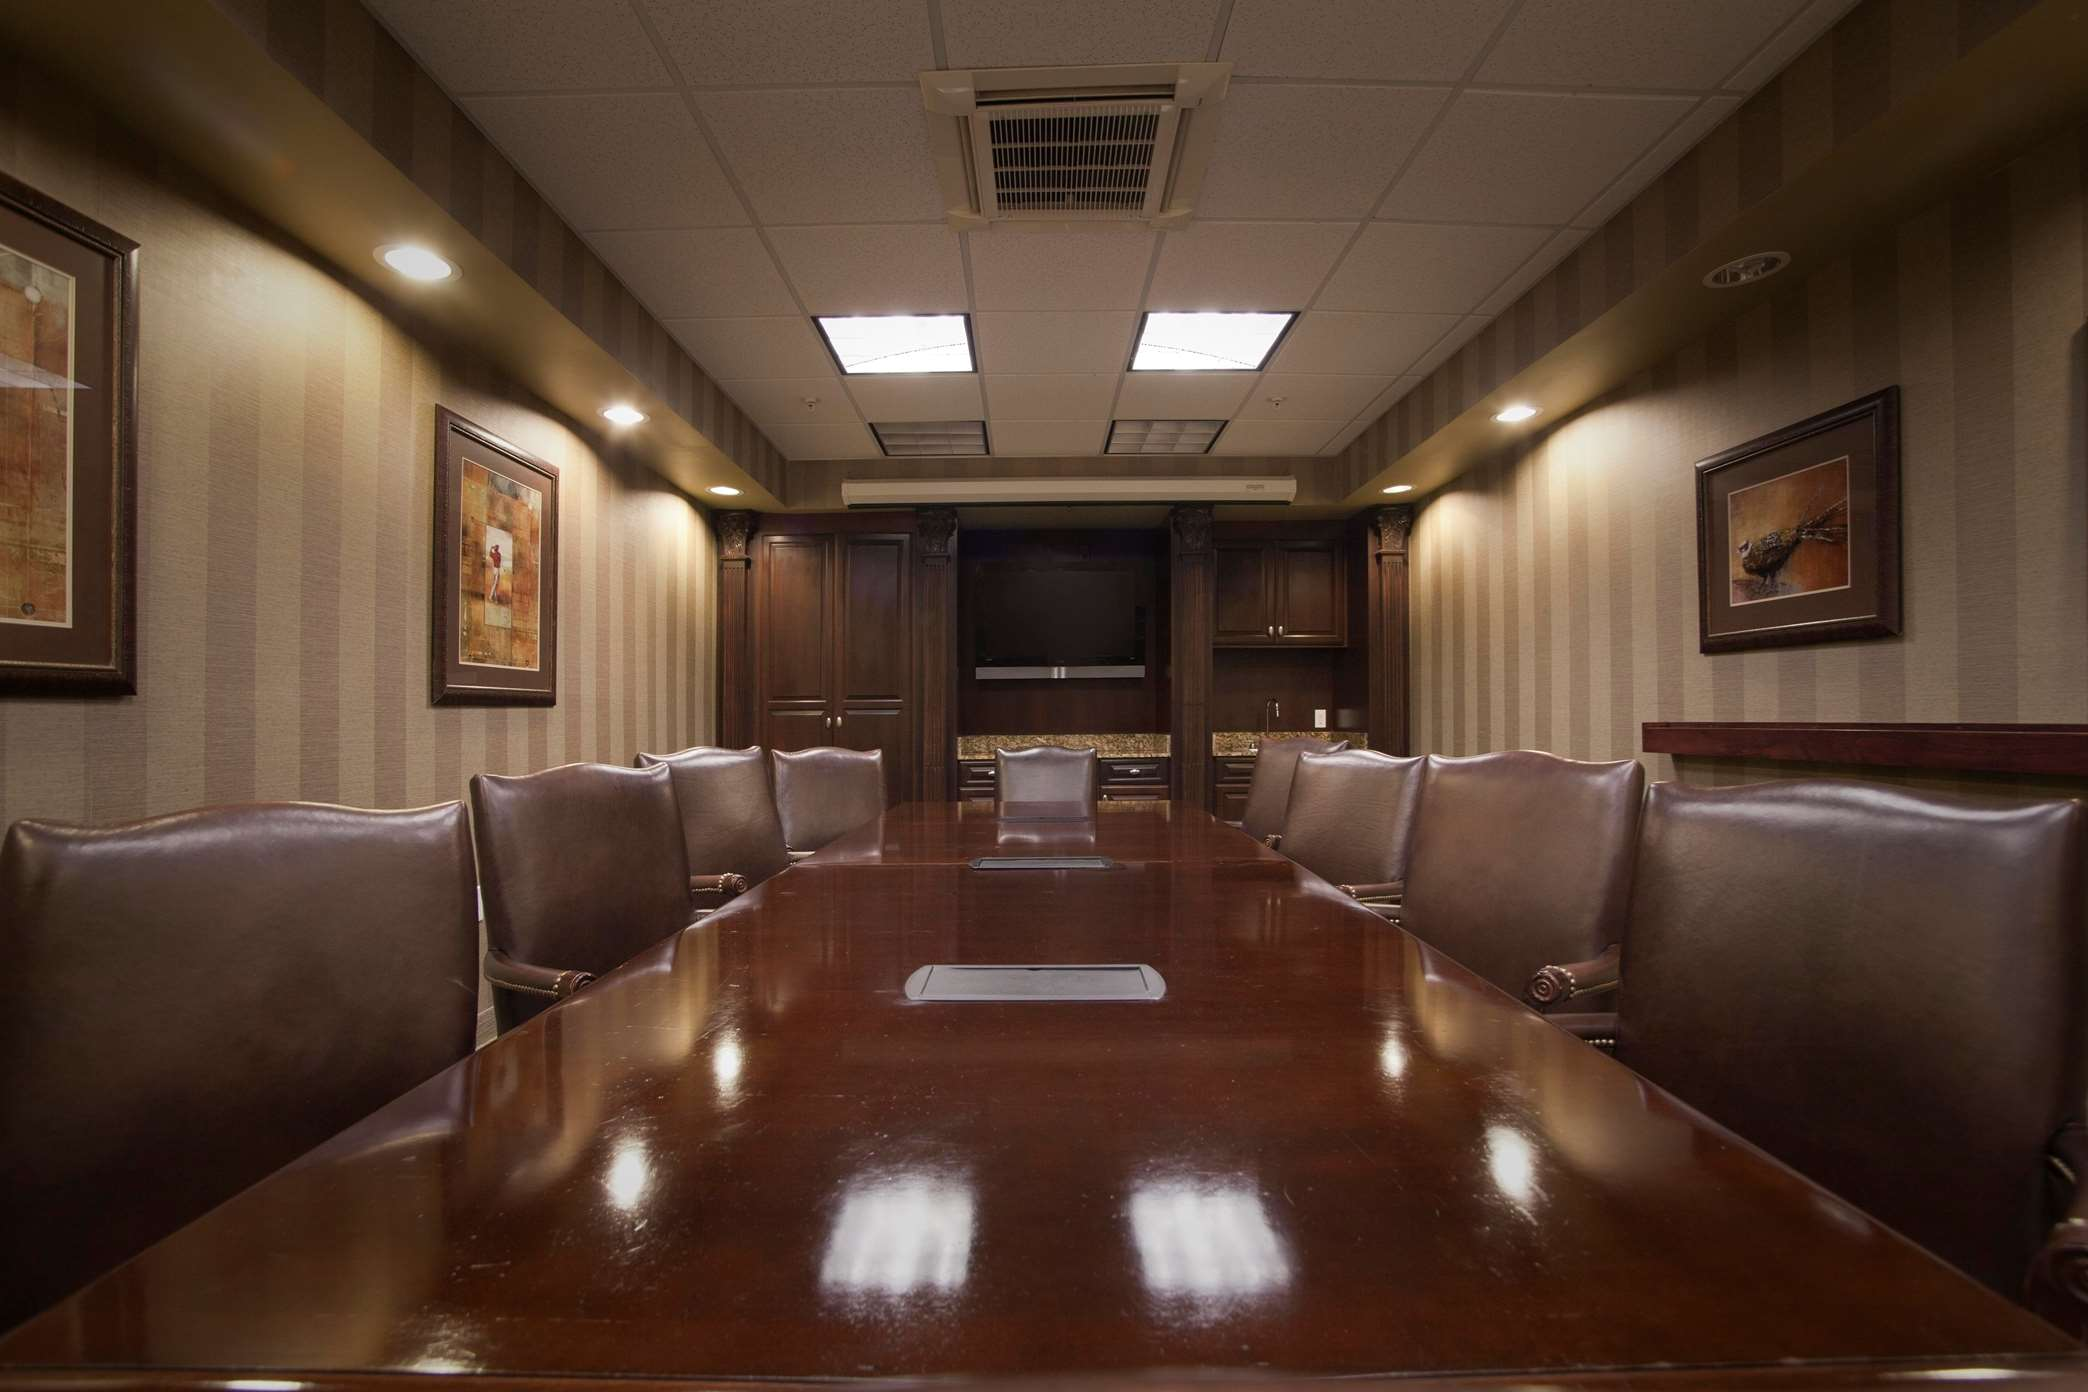 Homewood Suites by Hilton Albuquerque Airport image 8